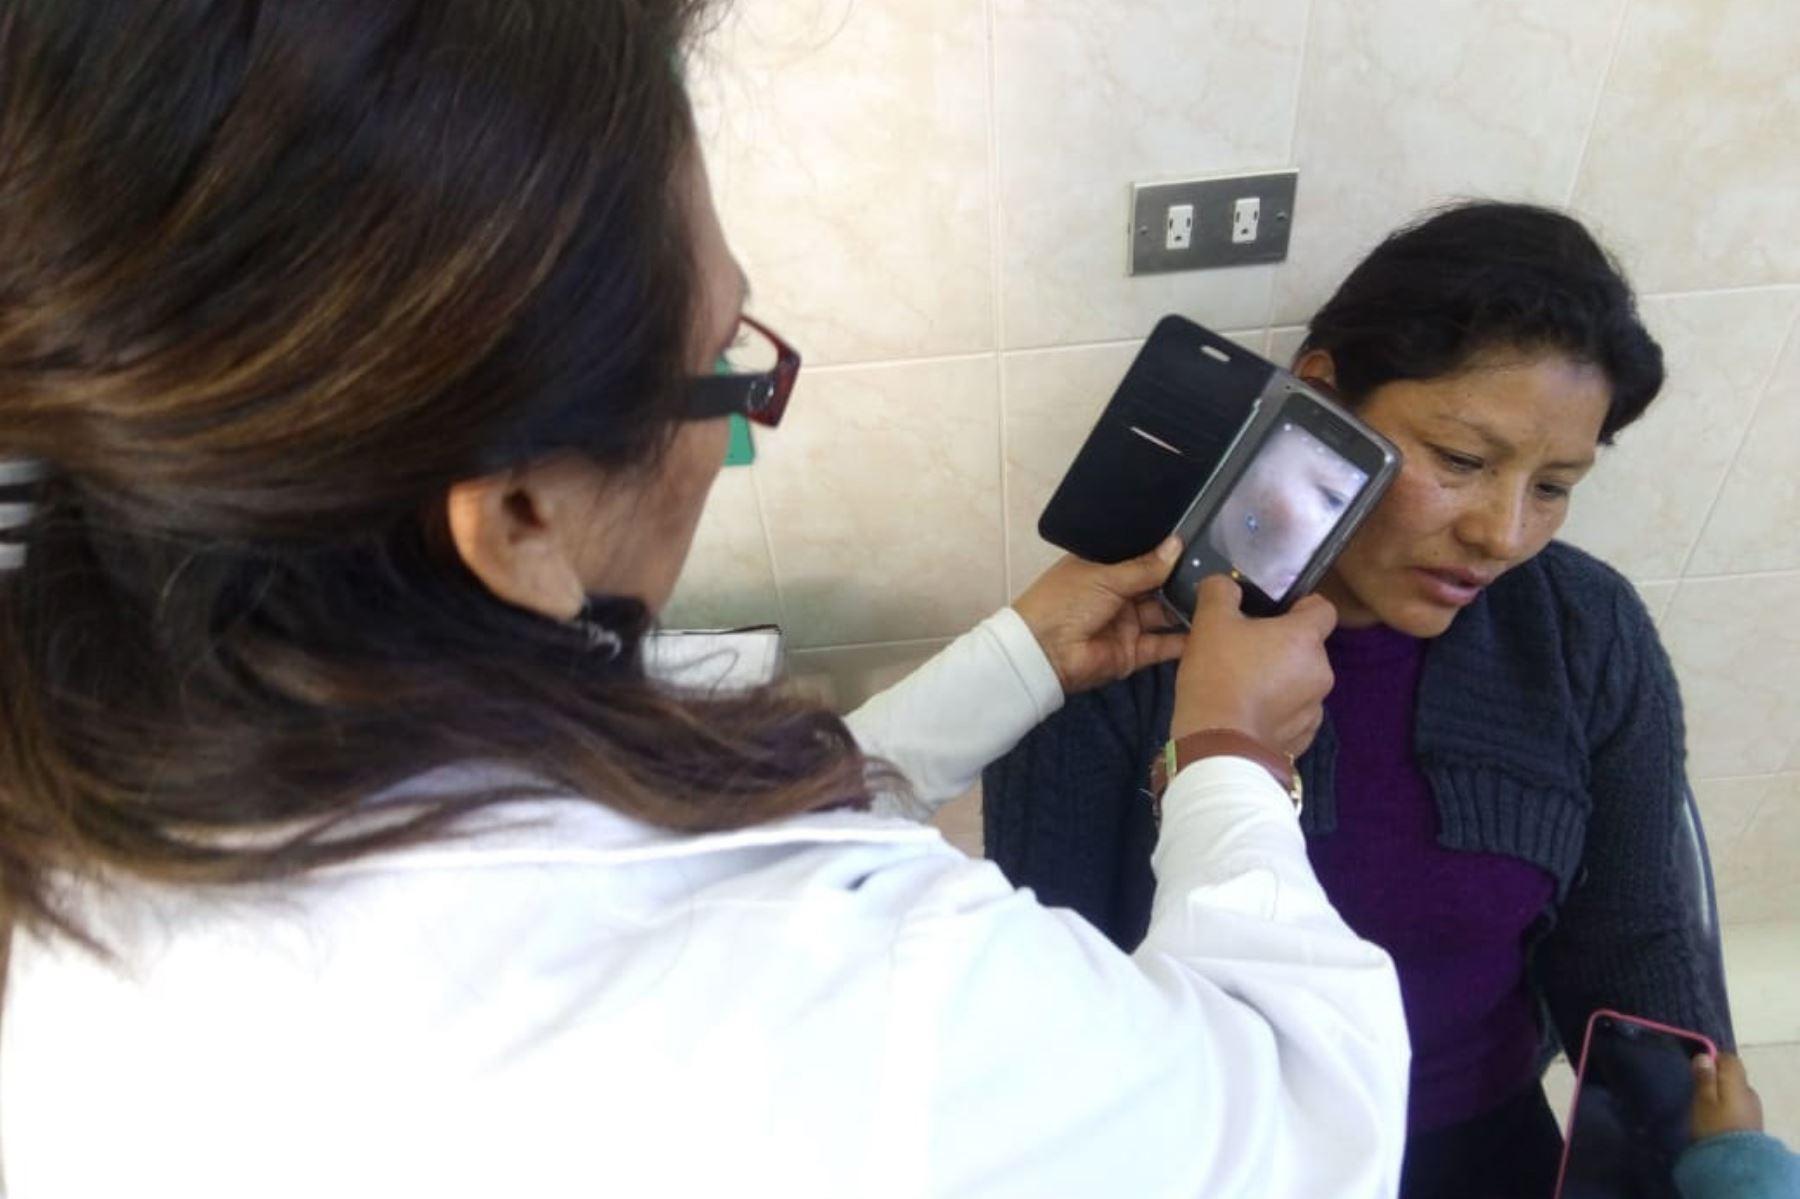 Presentan en Arequipa aplicativo móvil para detectar cáncer de piel. ANDINA